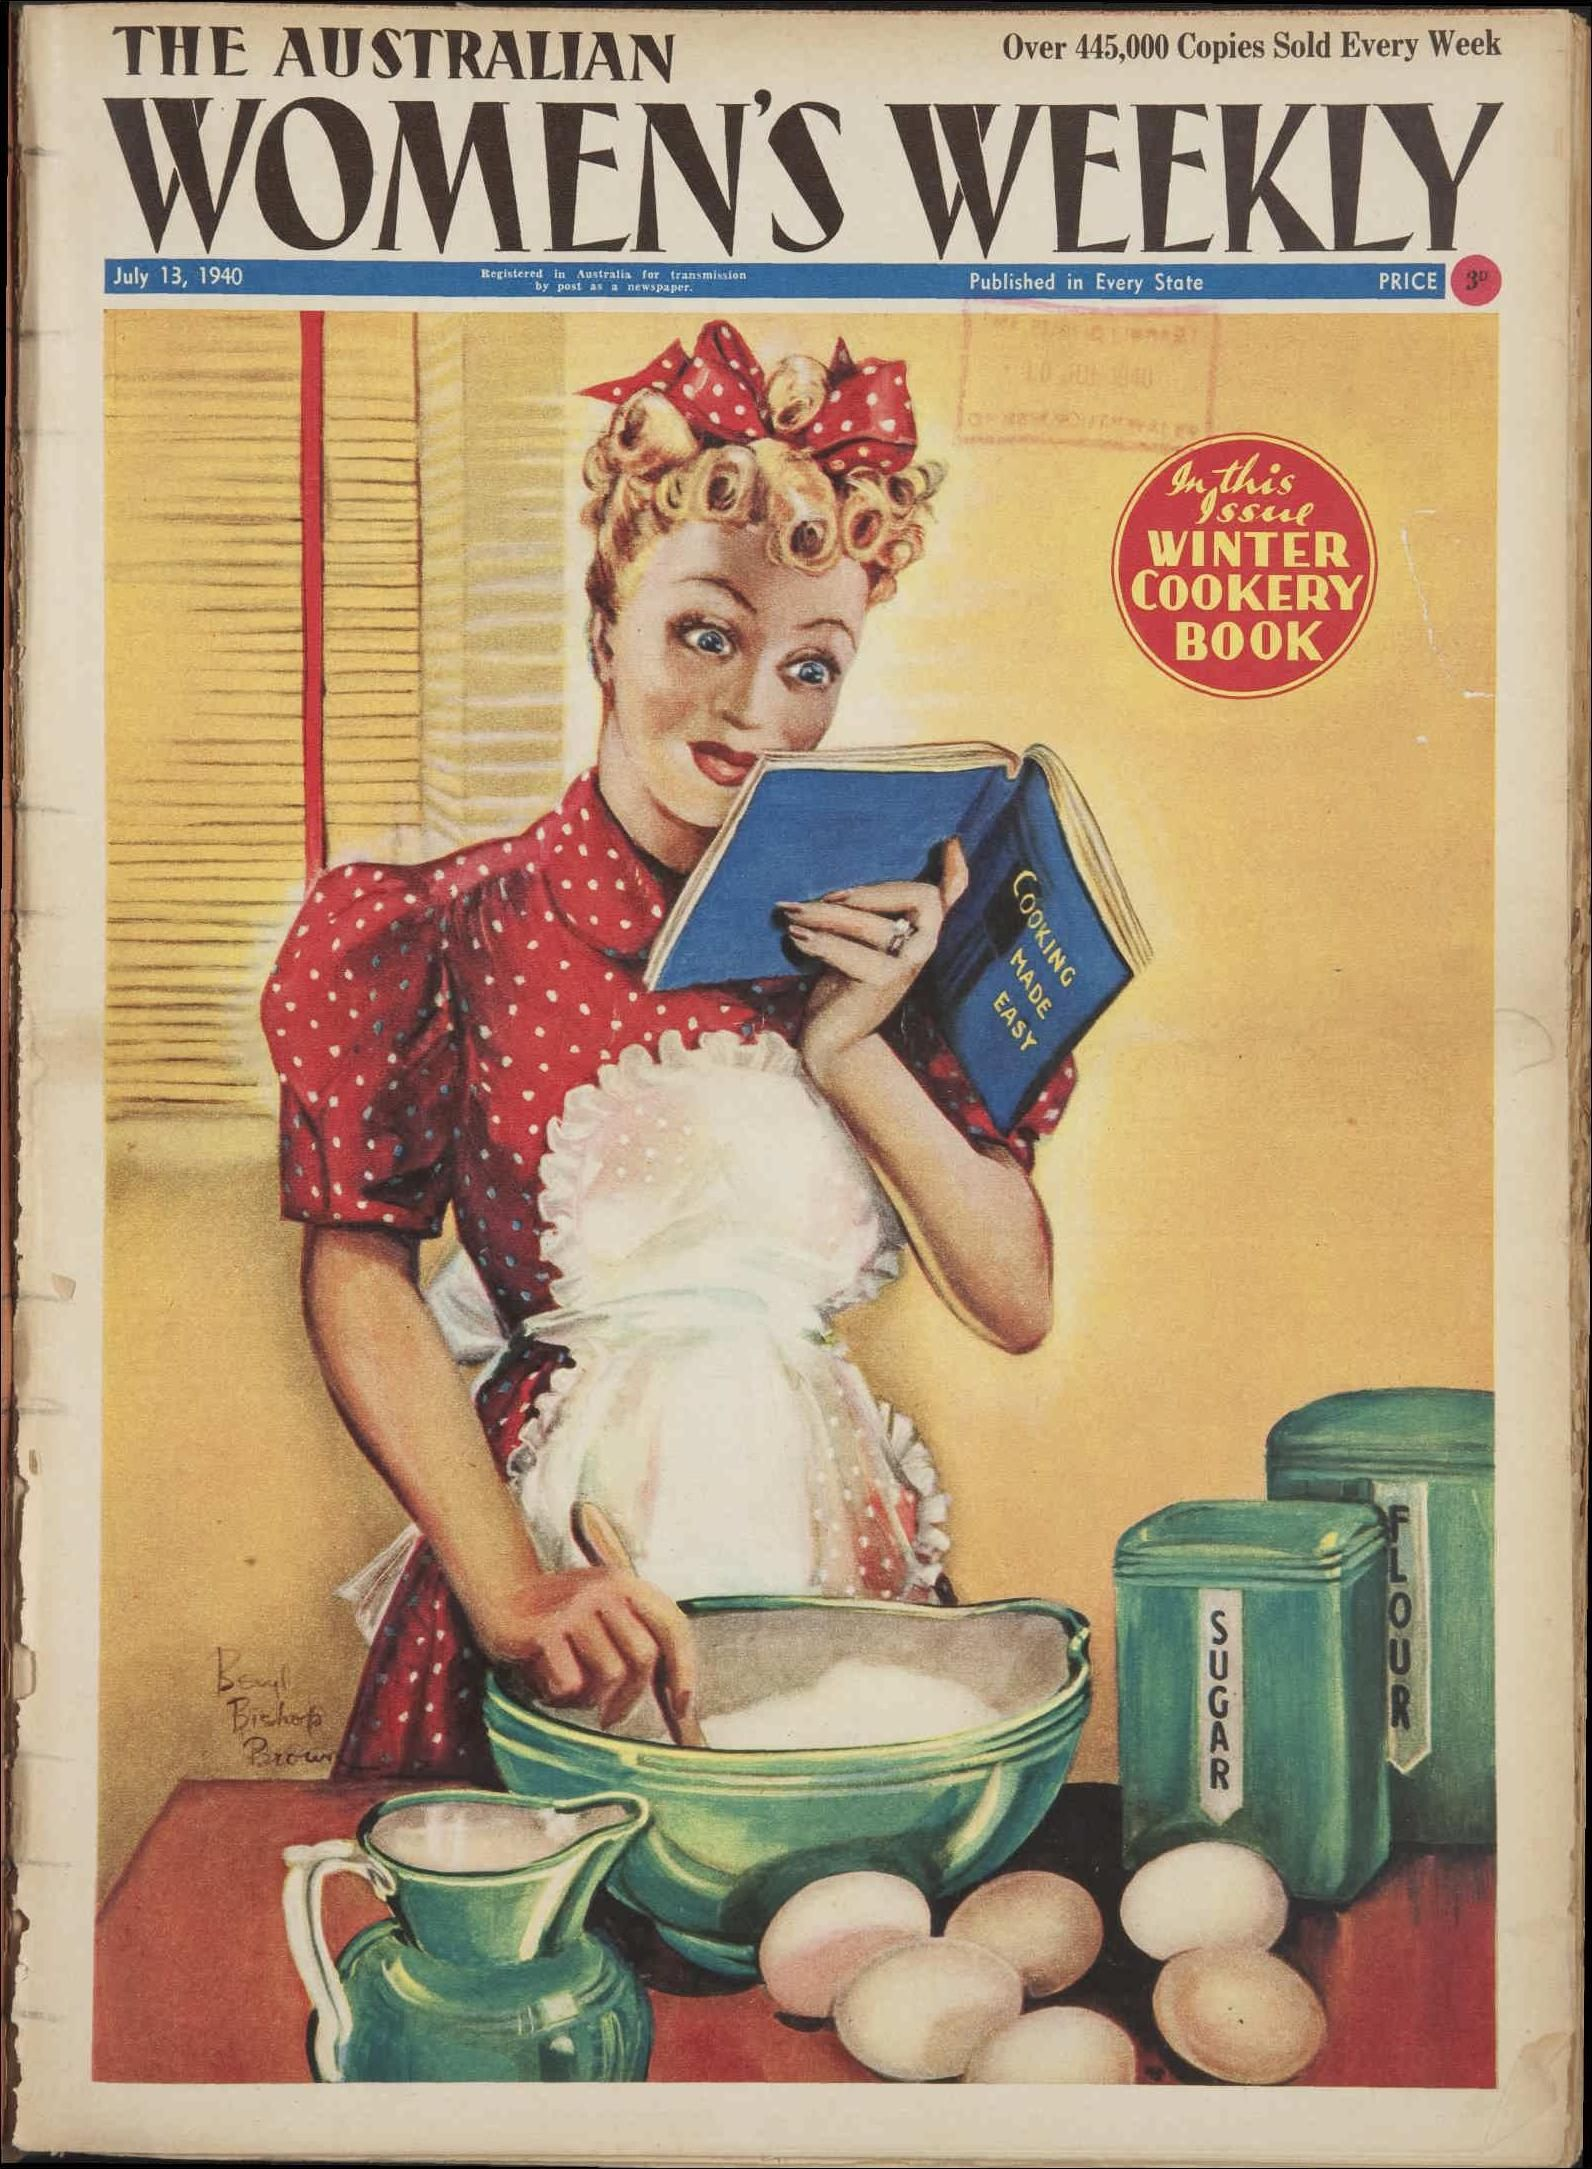 Issue 13 Jul 1940 - The Australian Womens Wee  Books - A Reader -4476